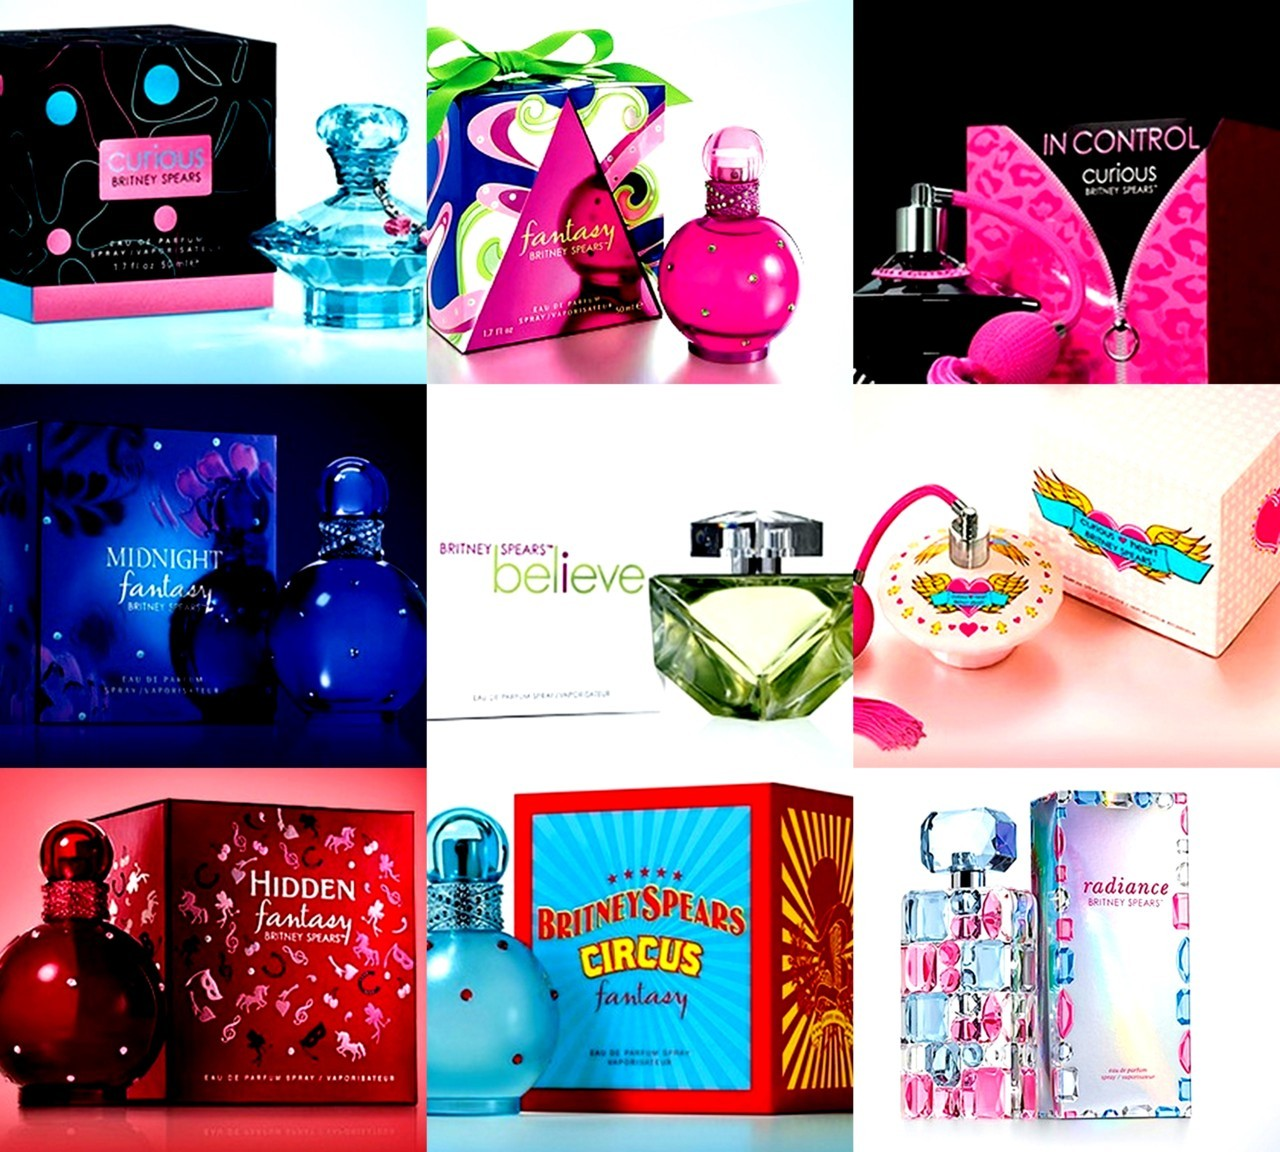 http://25.media.tumblr.com/tumblr_legk68jyoQ1qcxnhlo1_1280.jpg